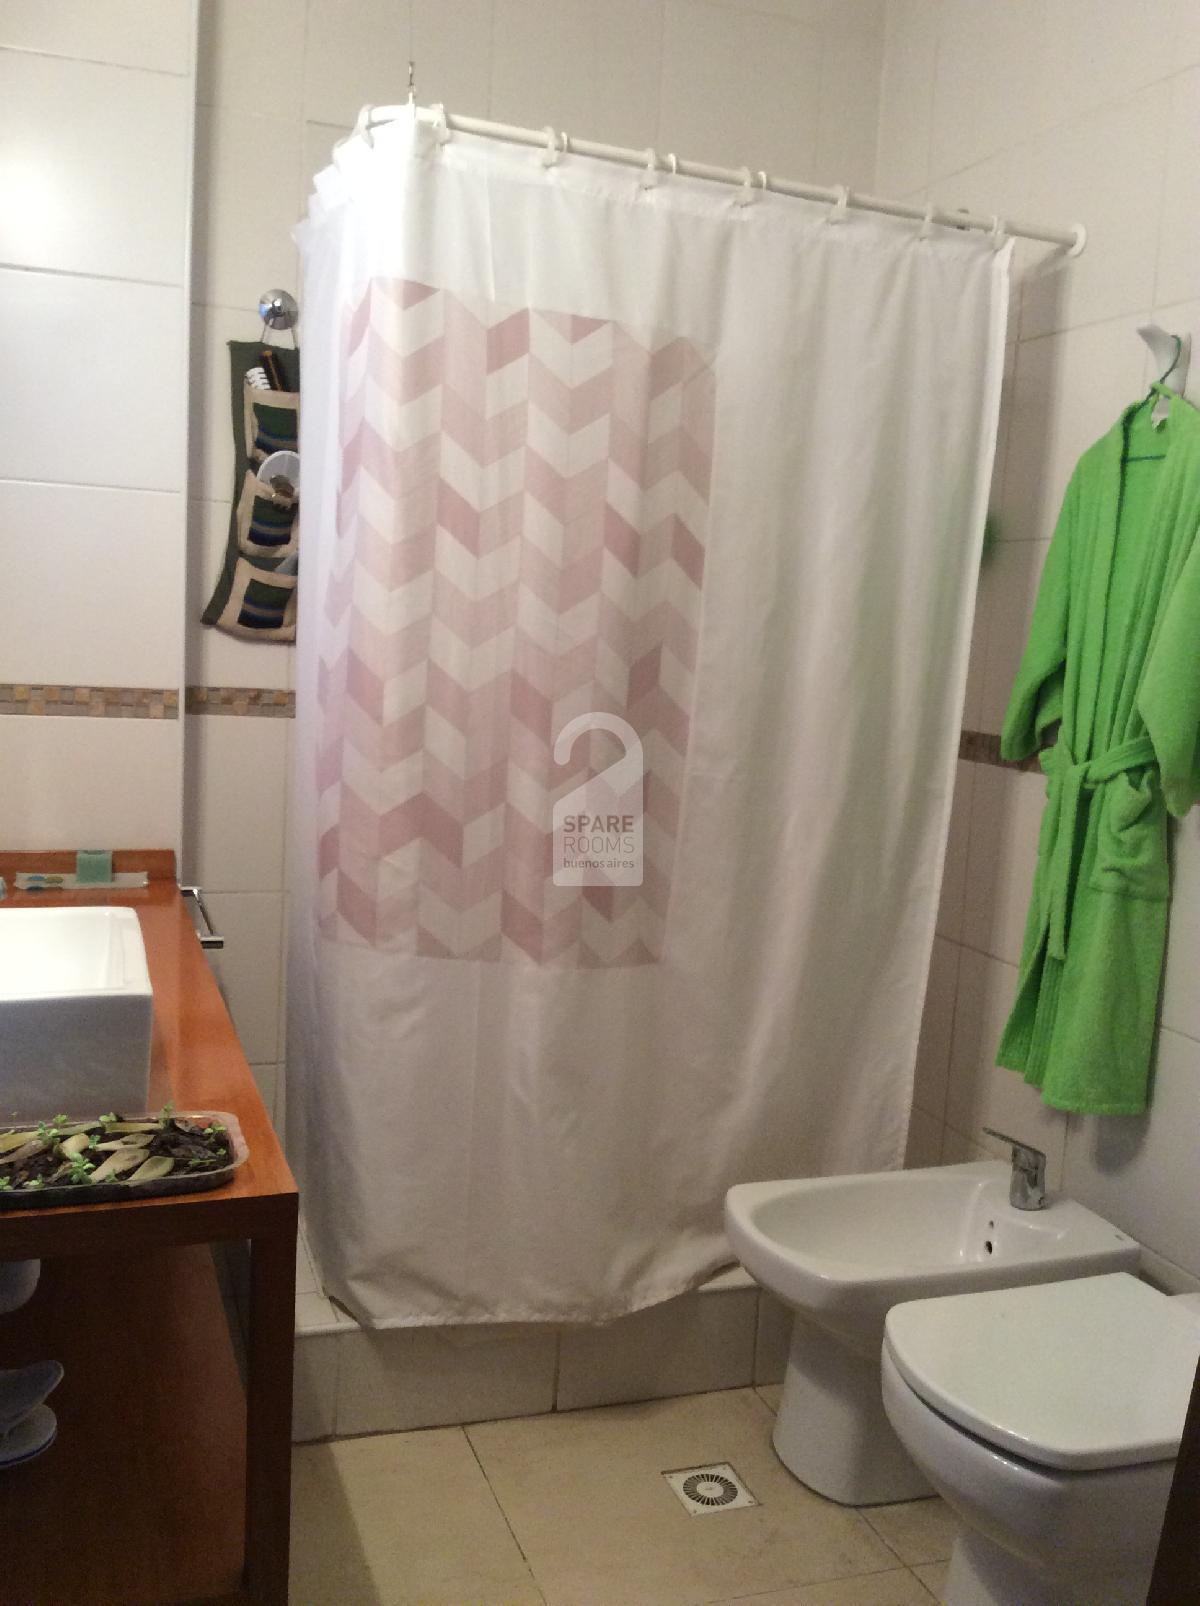 Private badhroom w/ shower in San Telmo